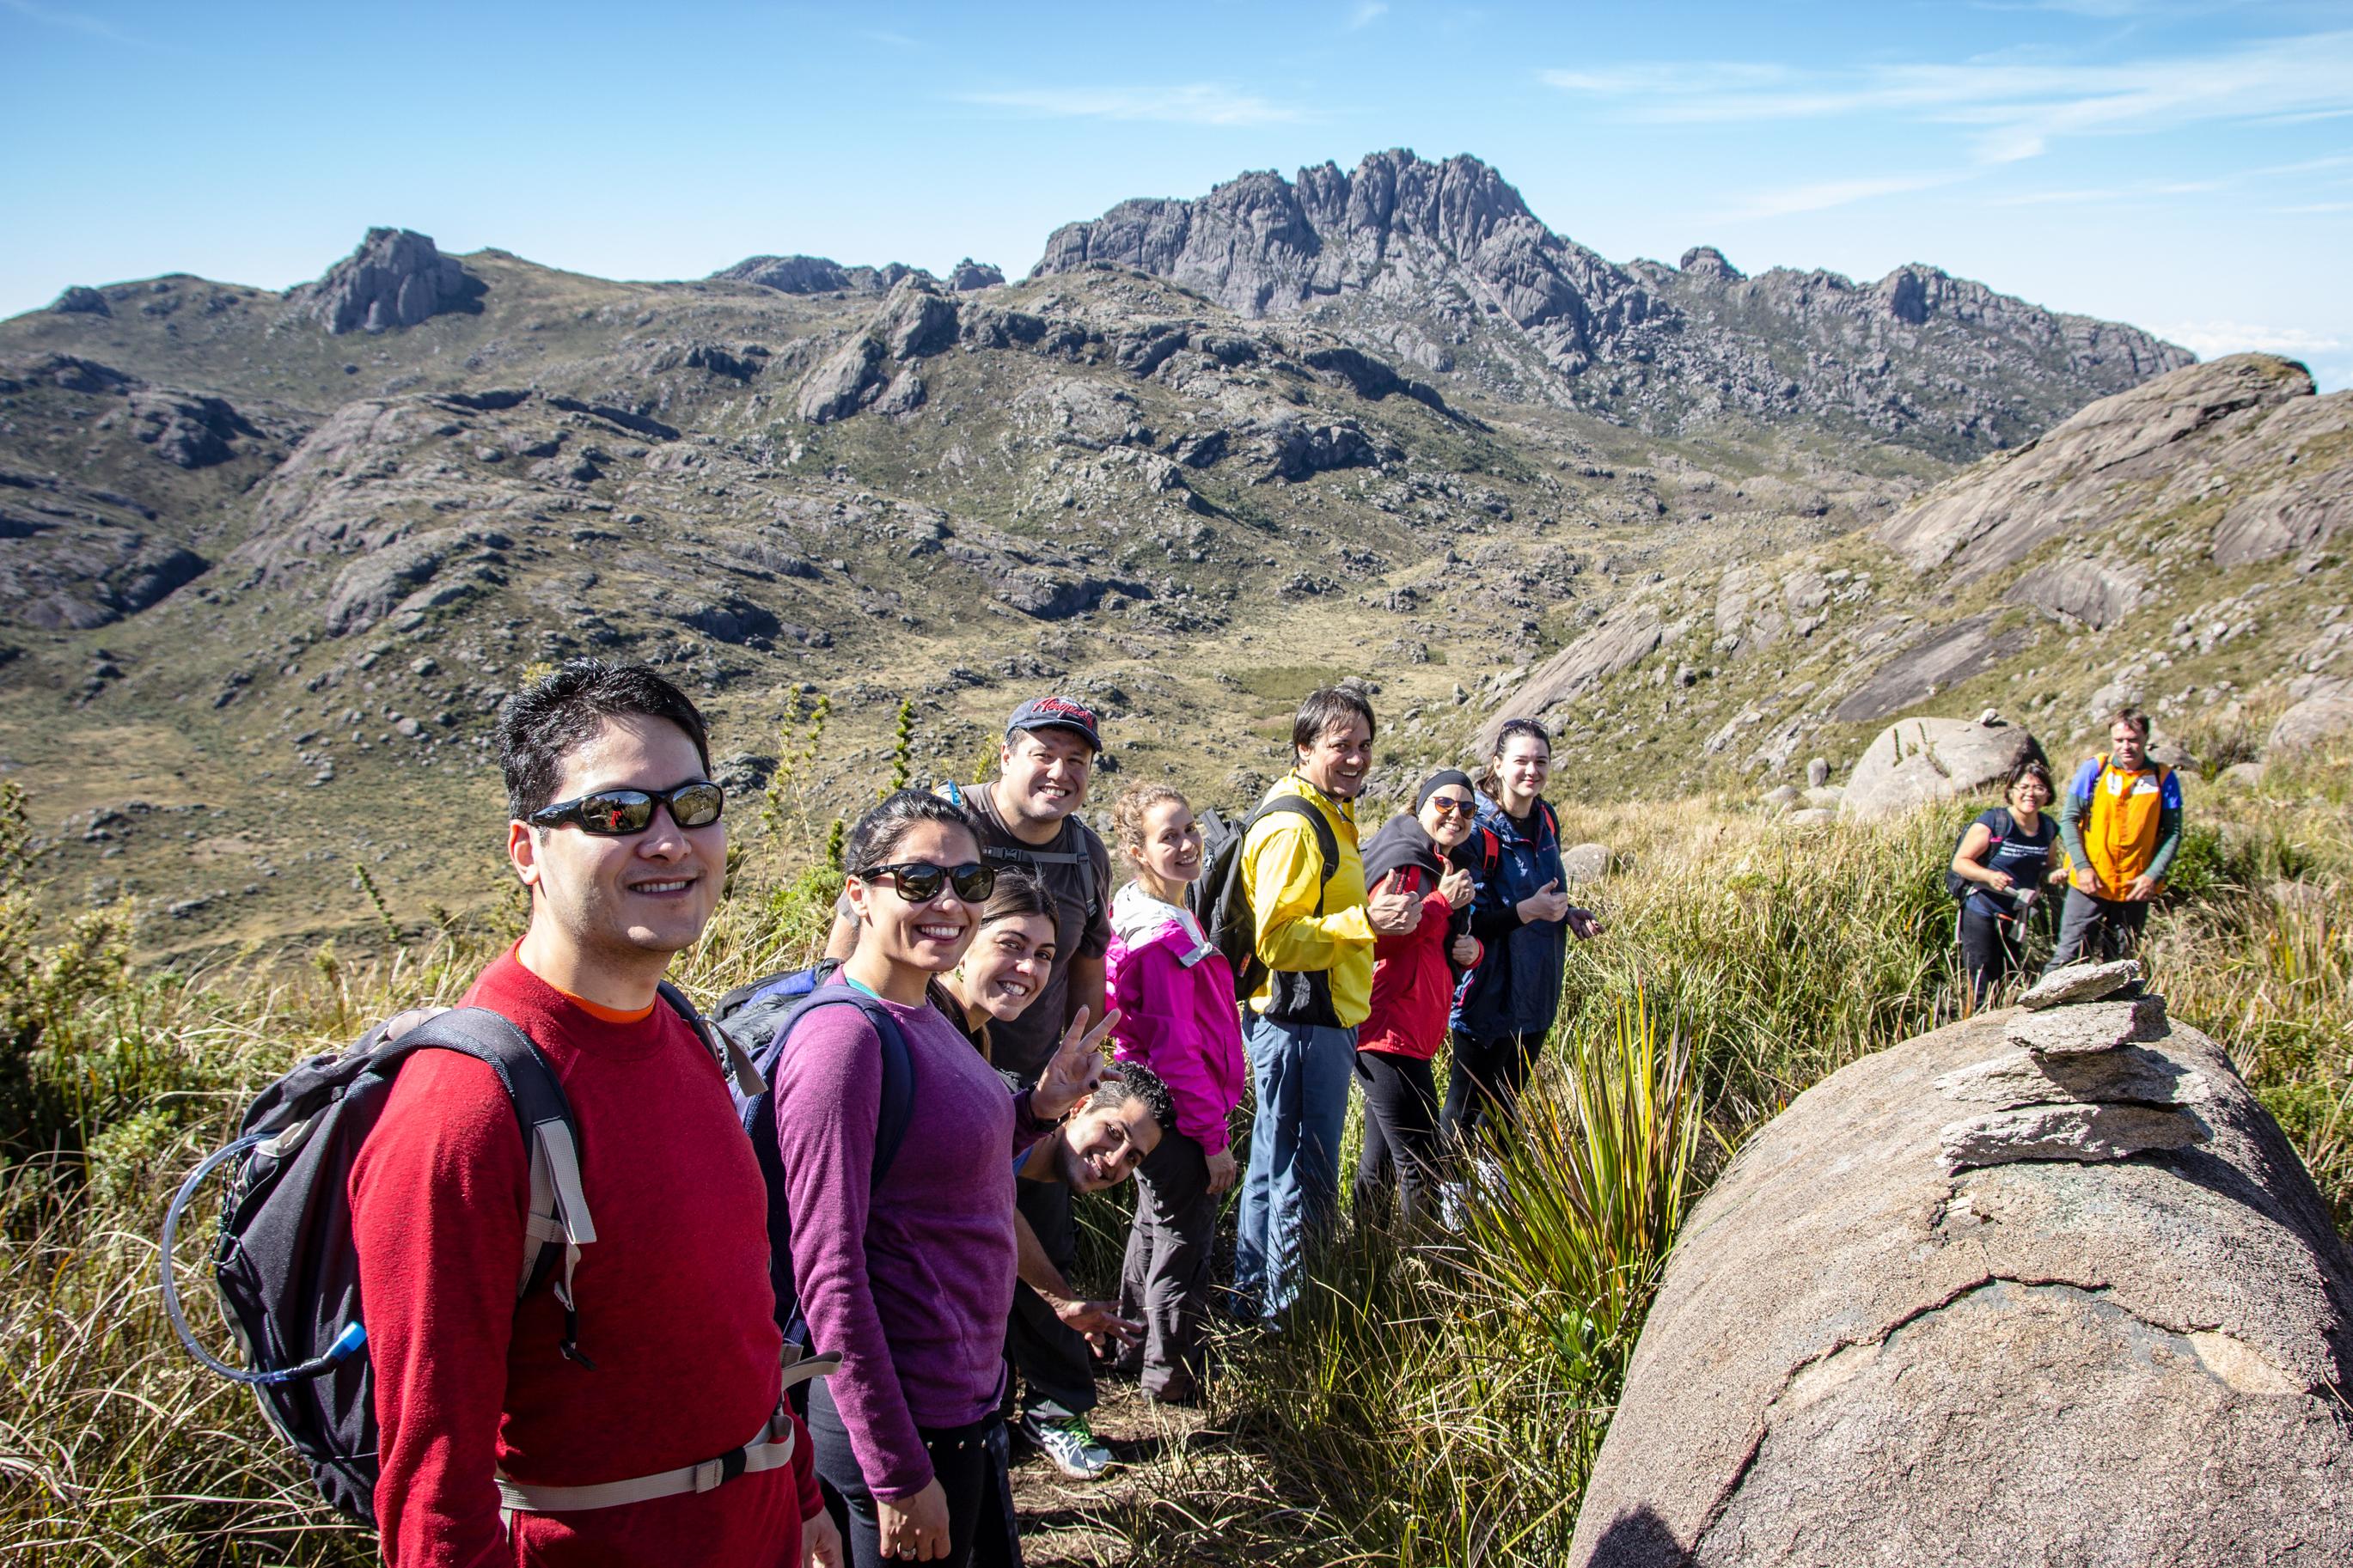 Grupo na trilha